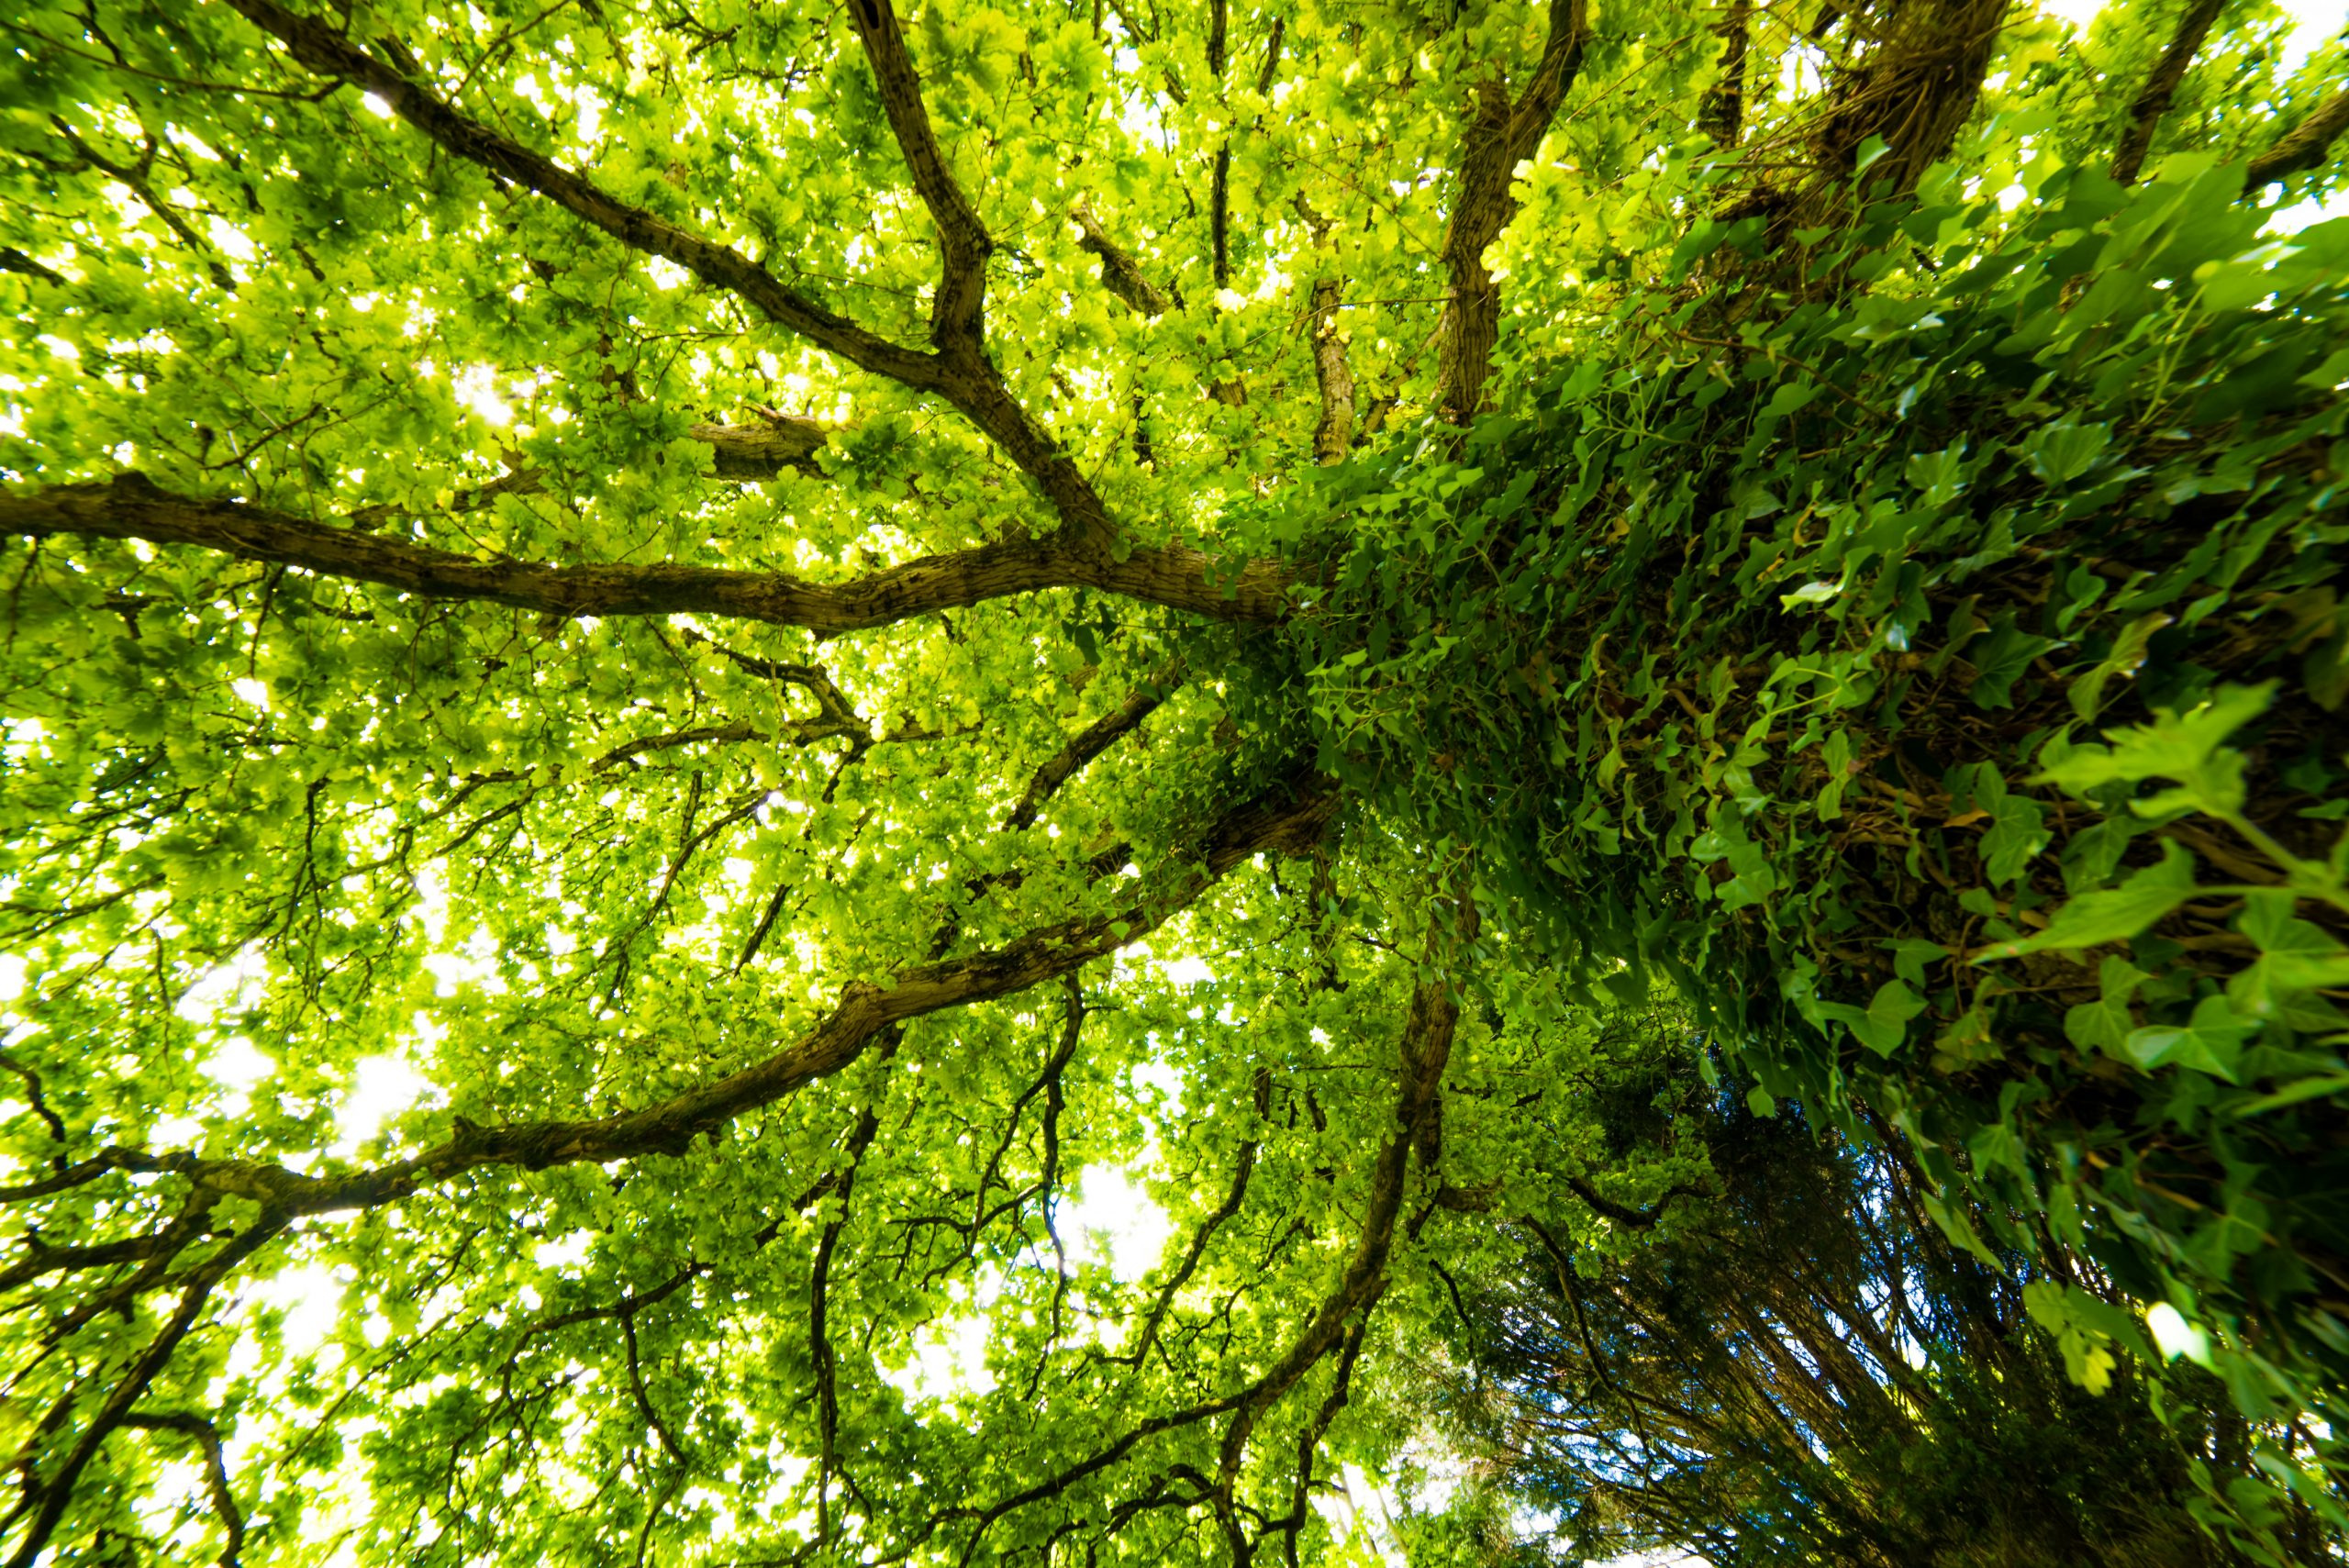 Large ancient British oak tree